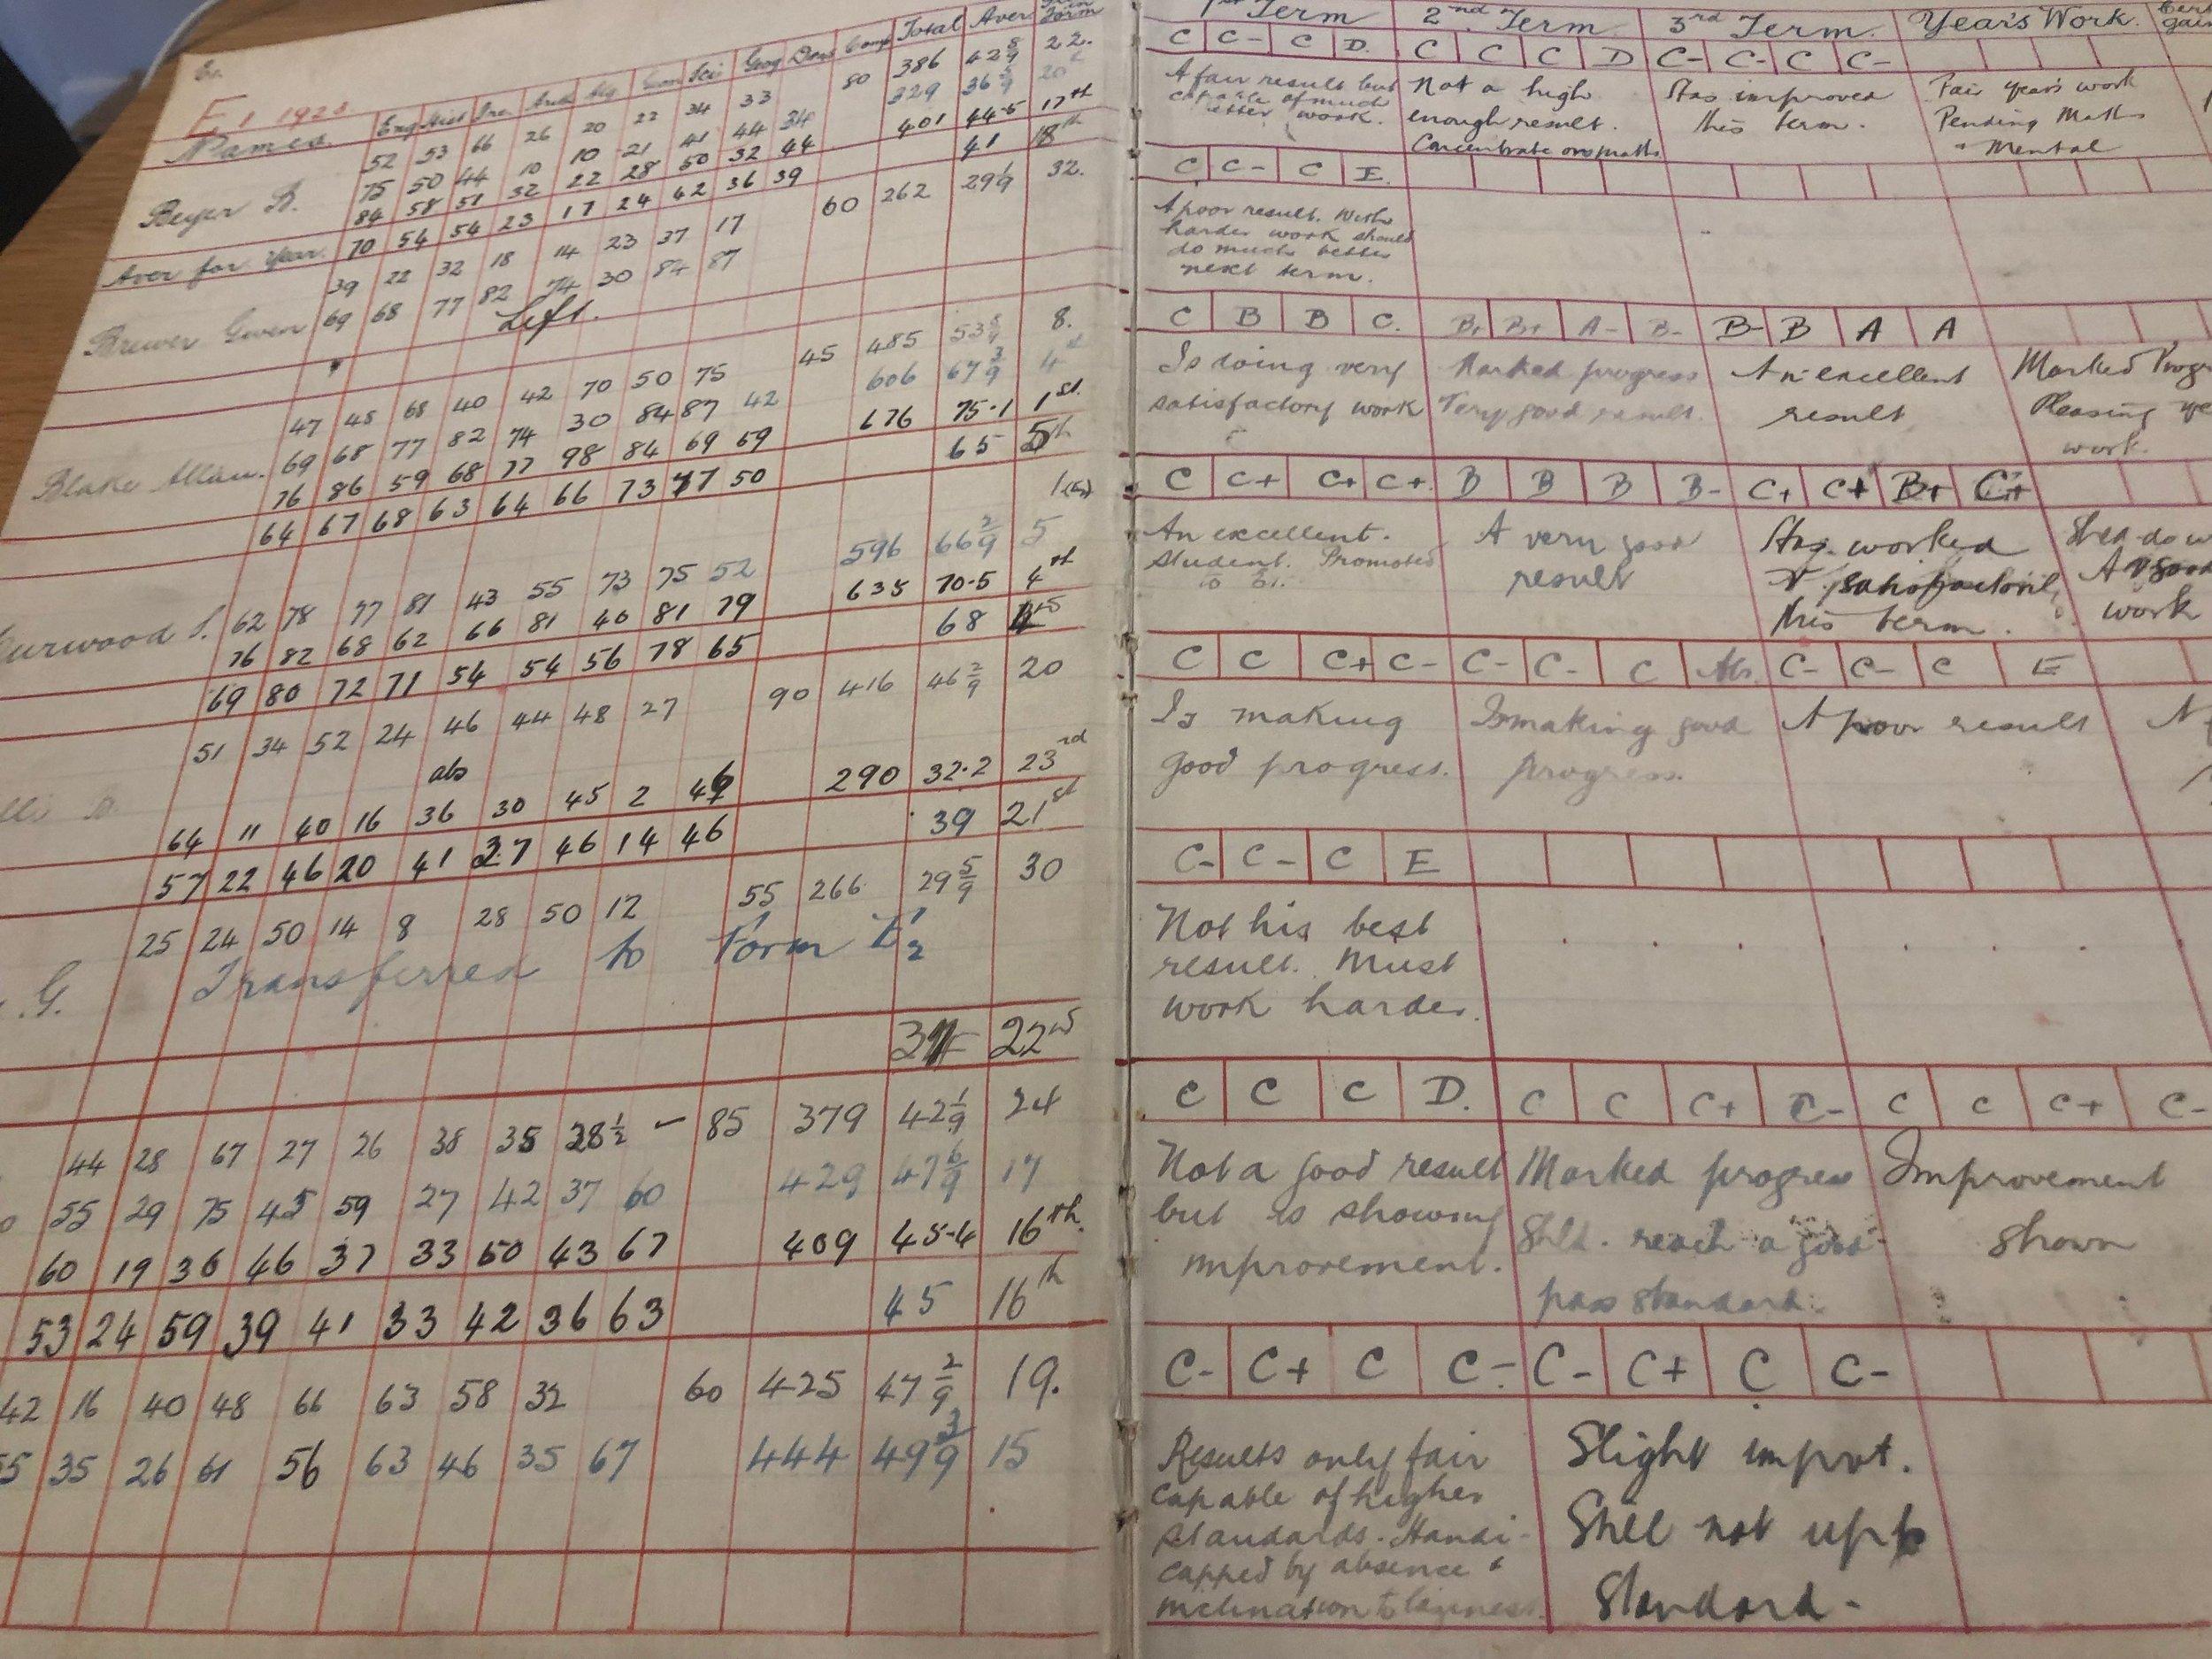 An exam marking book from 1923